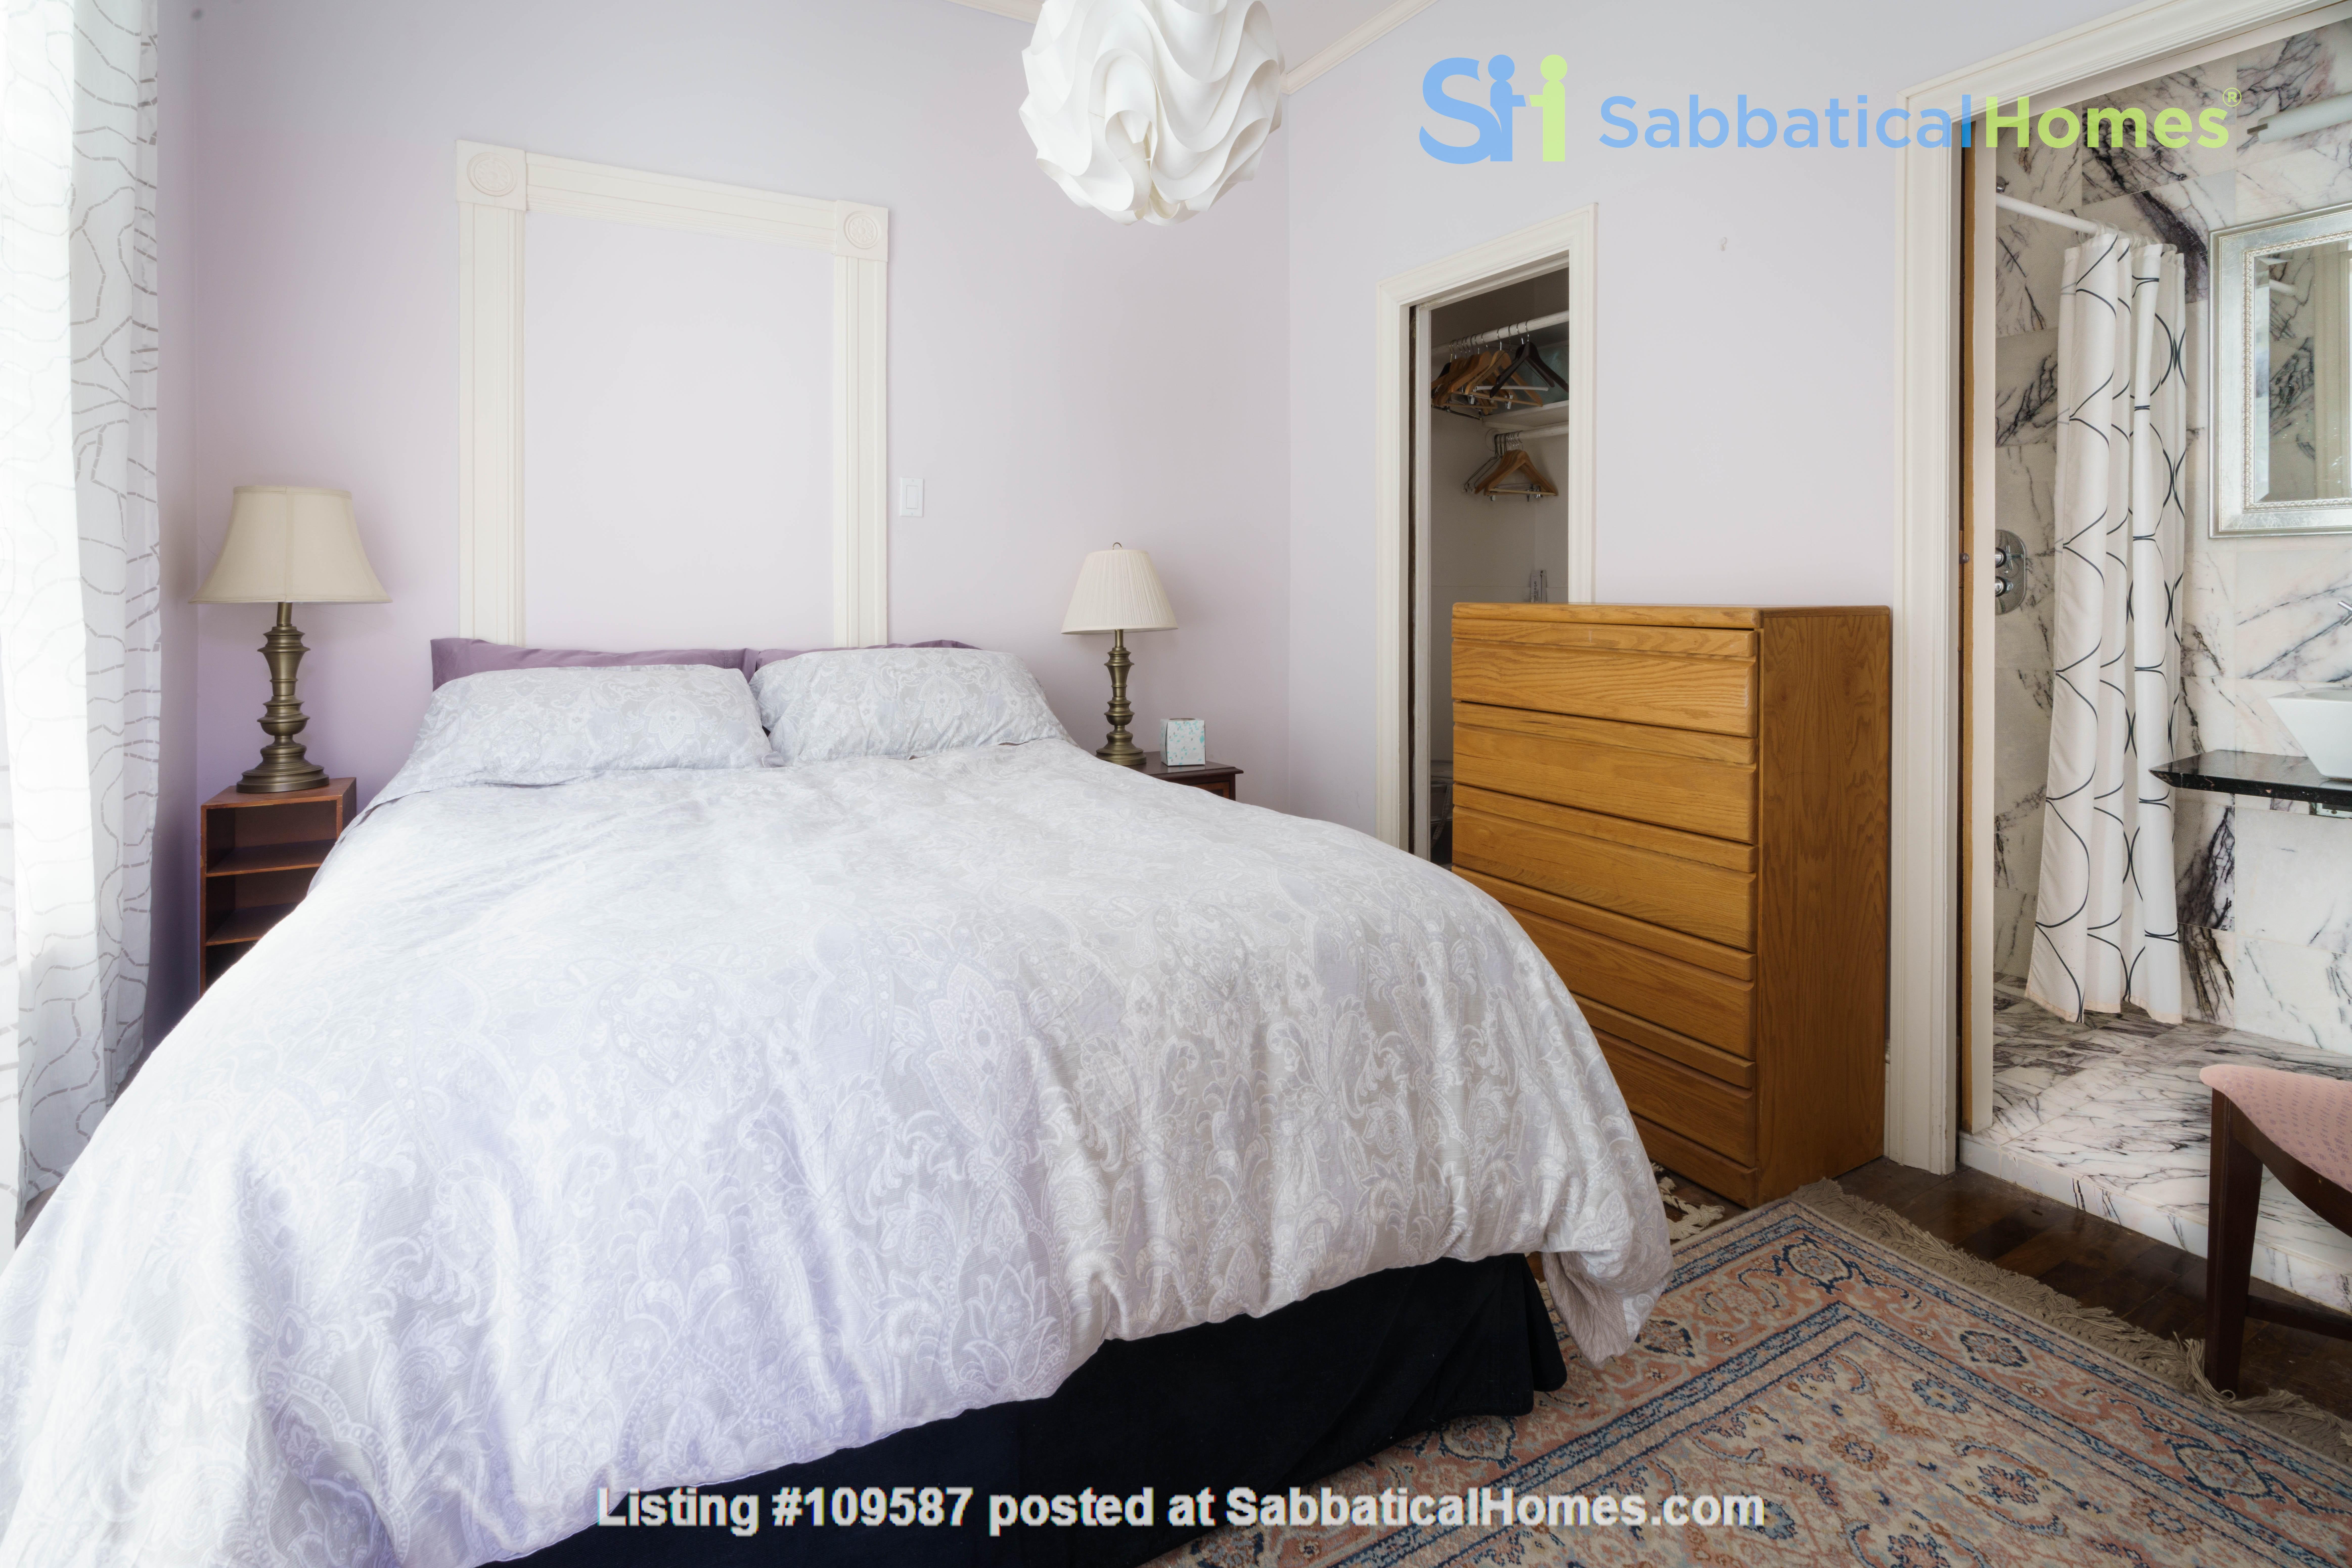 1335 Oxford Home Rental in Berkeley, California, United States 3